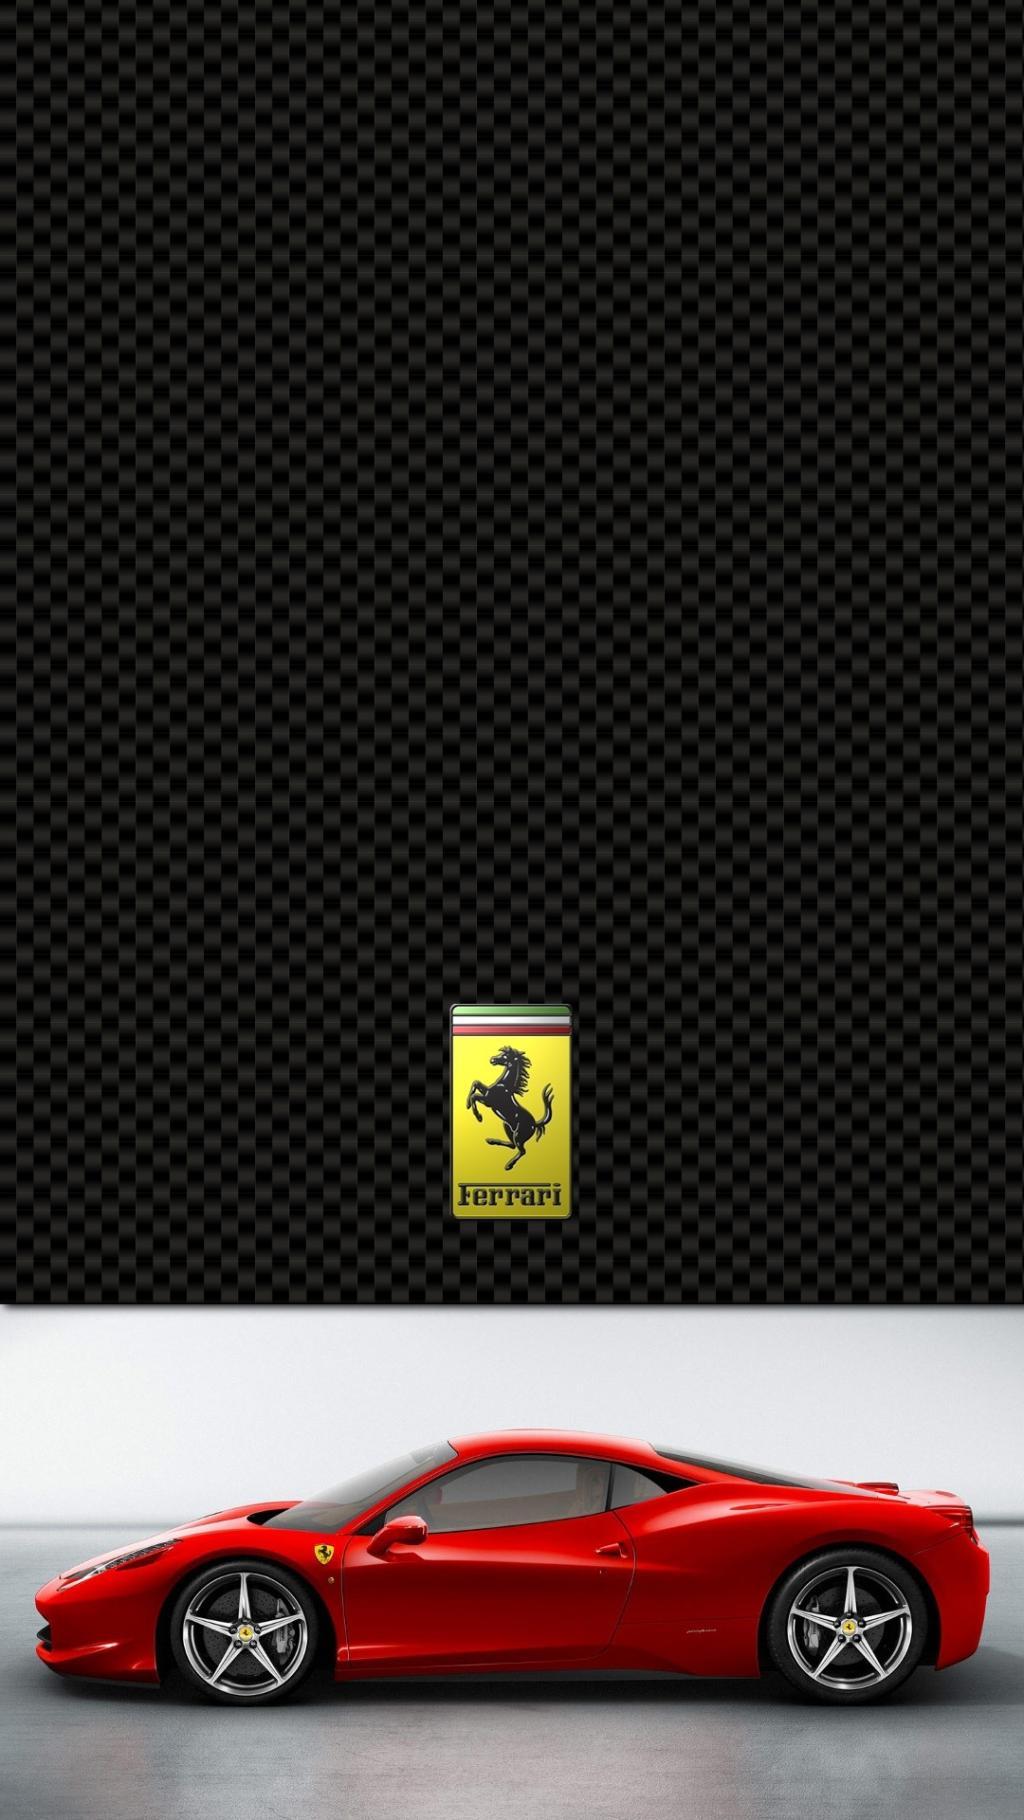 Hd Wallpapers Cars For Iphone 法拉利458 锁屏图片 高清手机壁纸 汽车 回车桌面